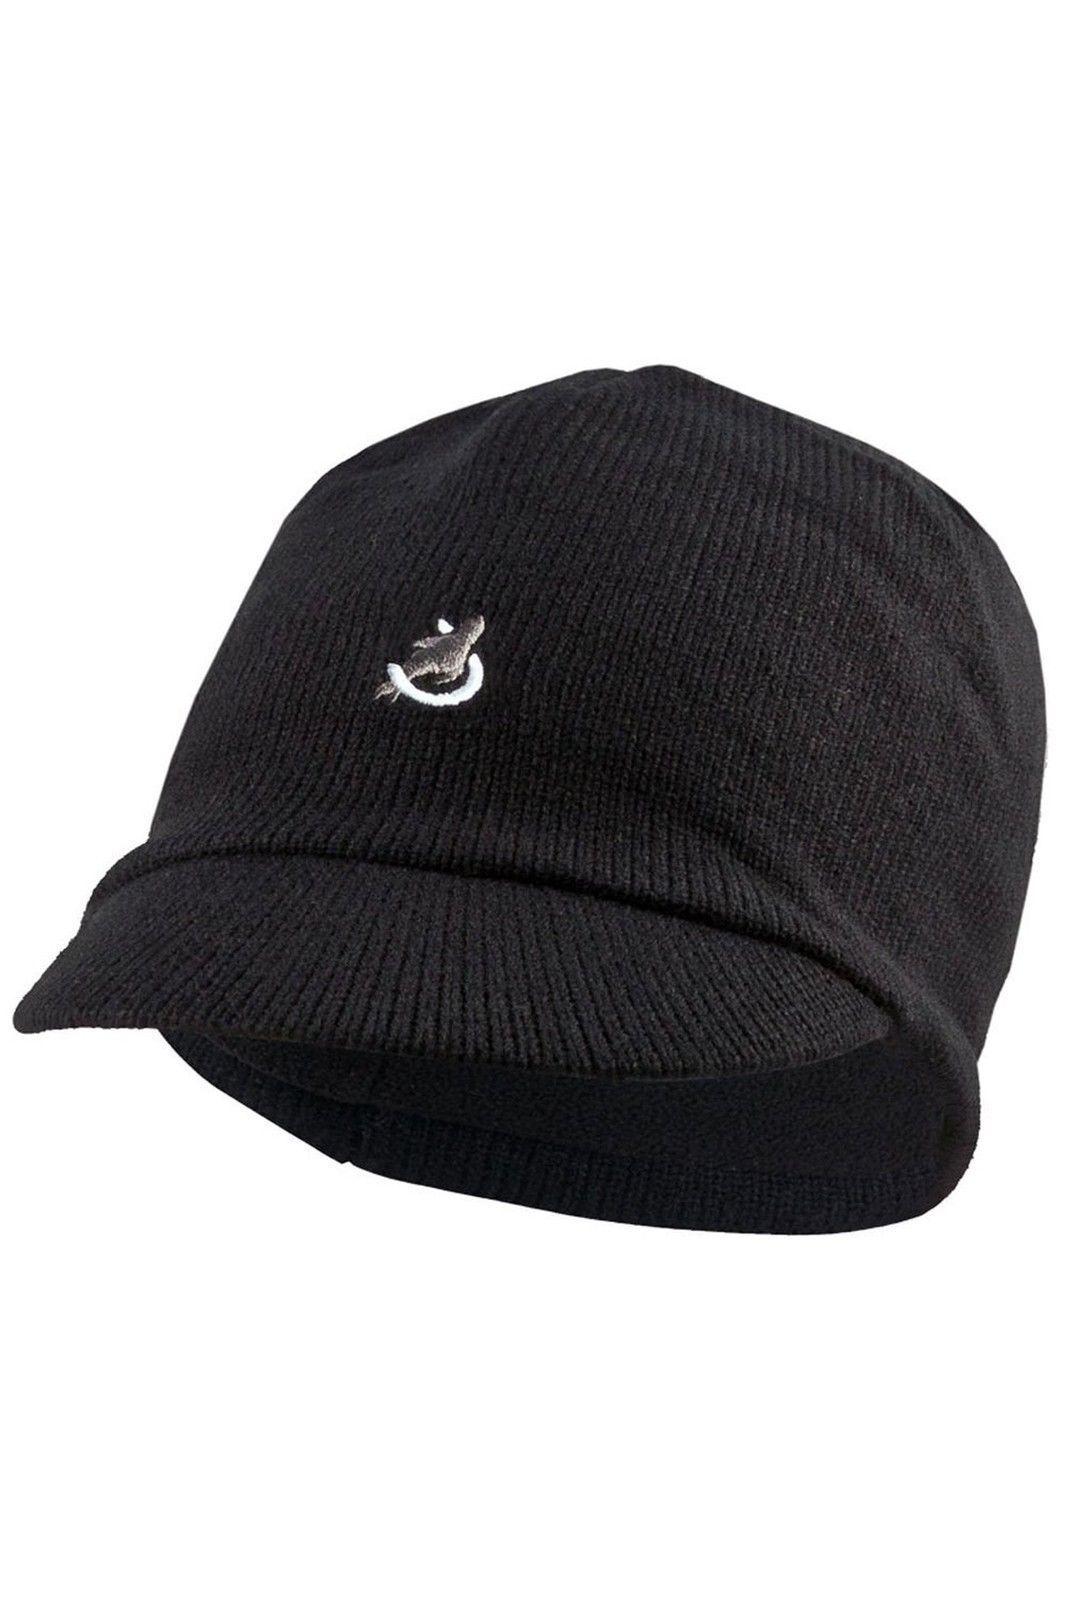 SealSkinz Peaked Waterproof Beanie Hat Black XXL 131140700150 for ... c1a4fb2dfbfa